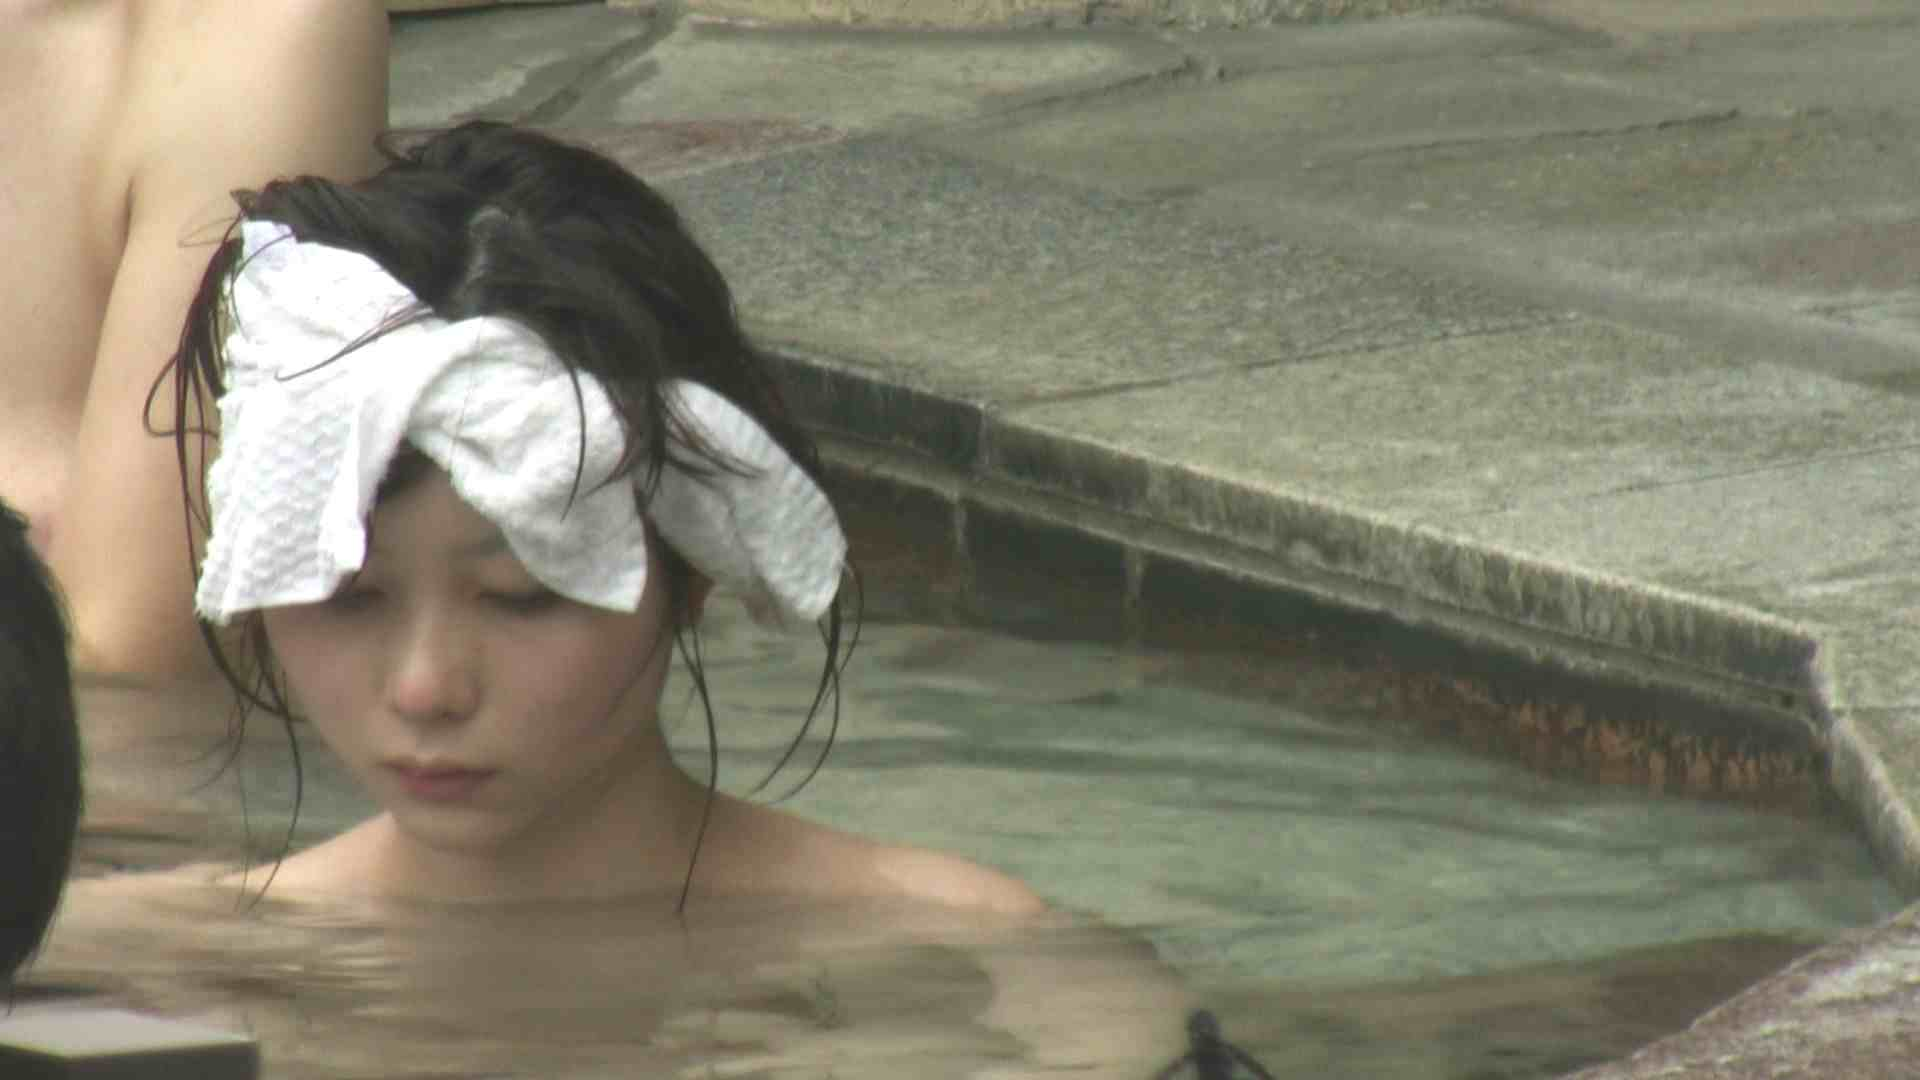 Aquaな露天風呂Vol.147 HなOL | 露天  103pic 15